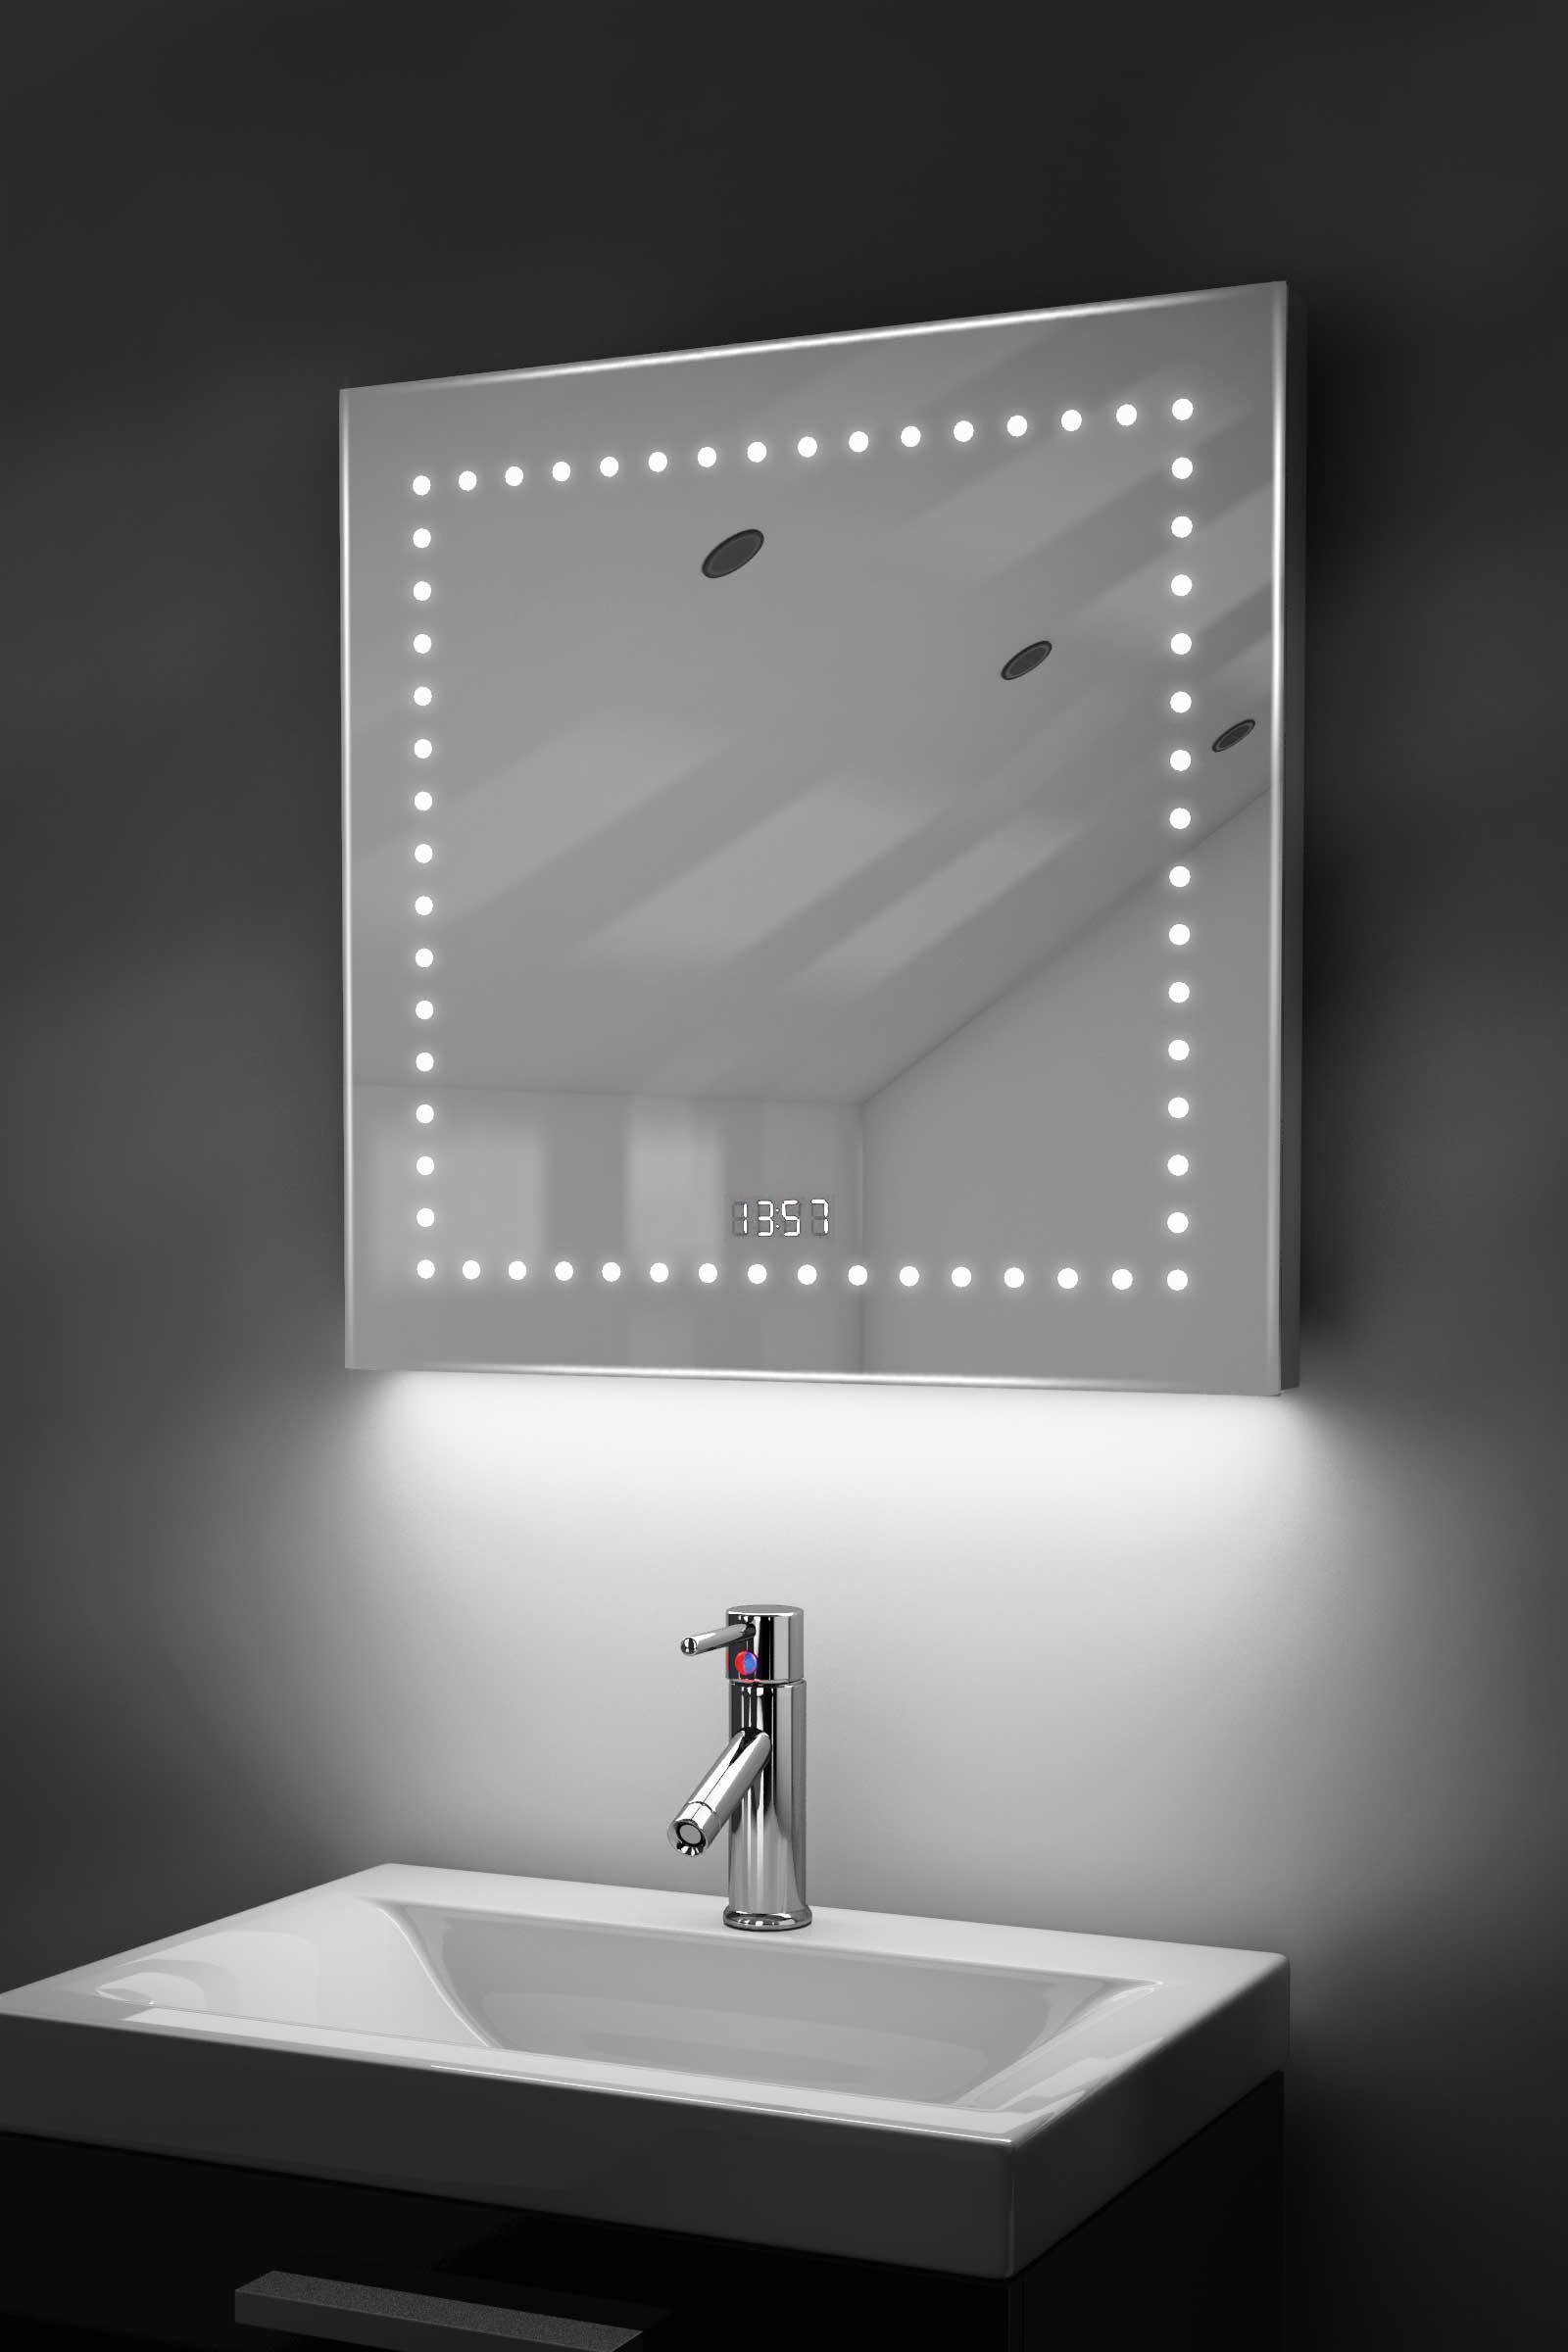 Digital Clock Shaver Bathroom Mirror With Under Lighting Demist Sensor K183 K183g Ebay